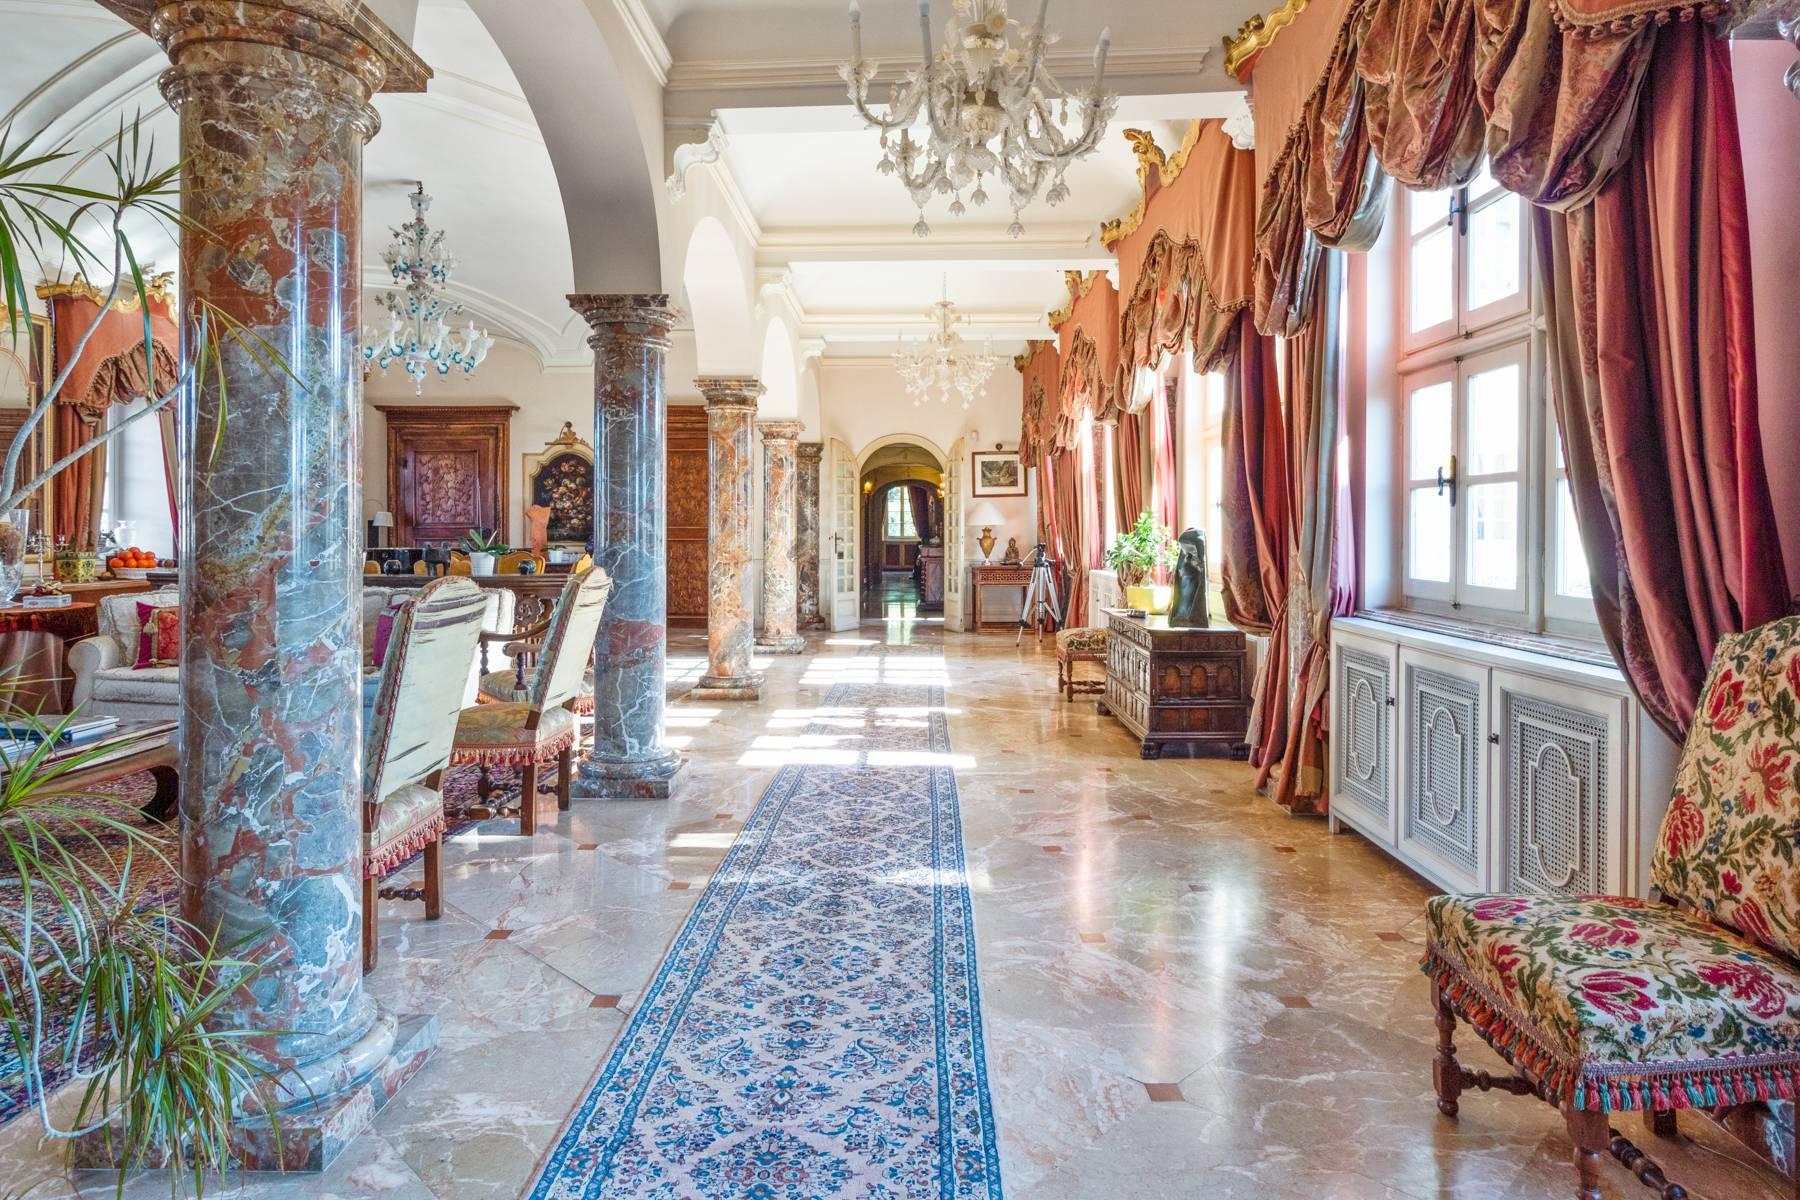 Villa in Vendita a Pino Torinese: 5 locali, 2087 mq - Foto 4